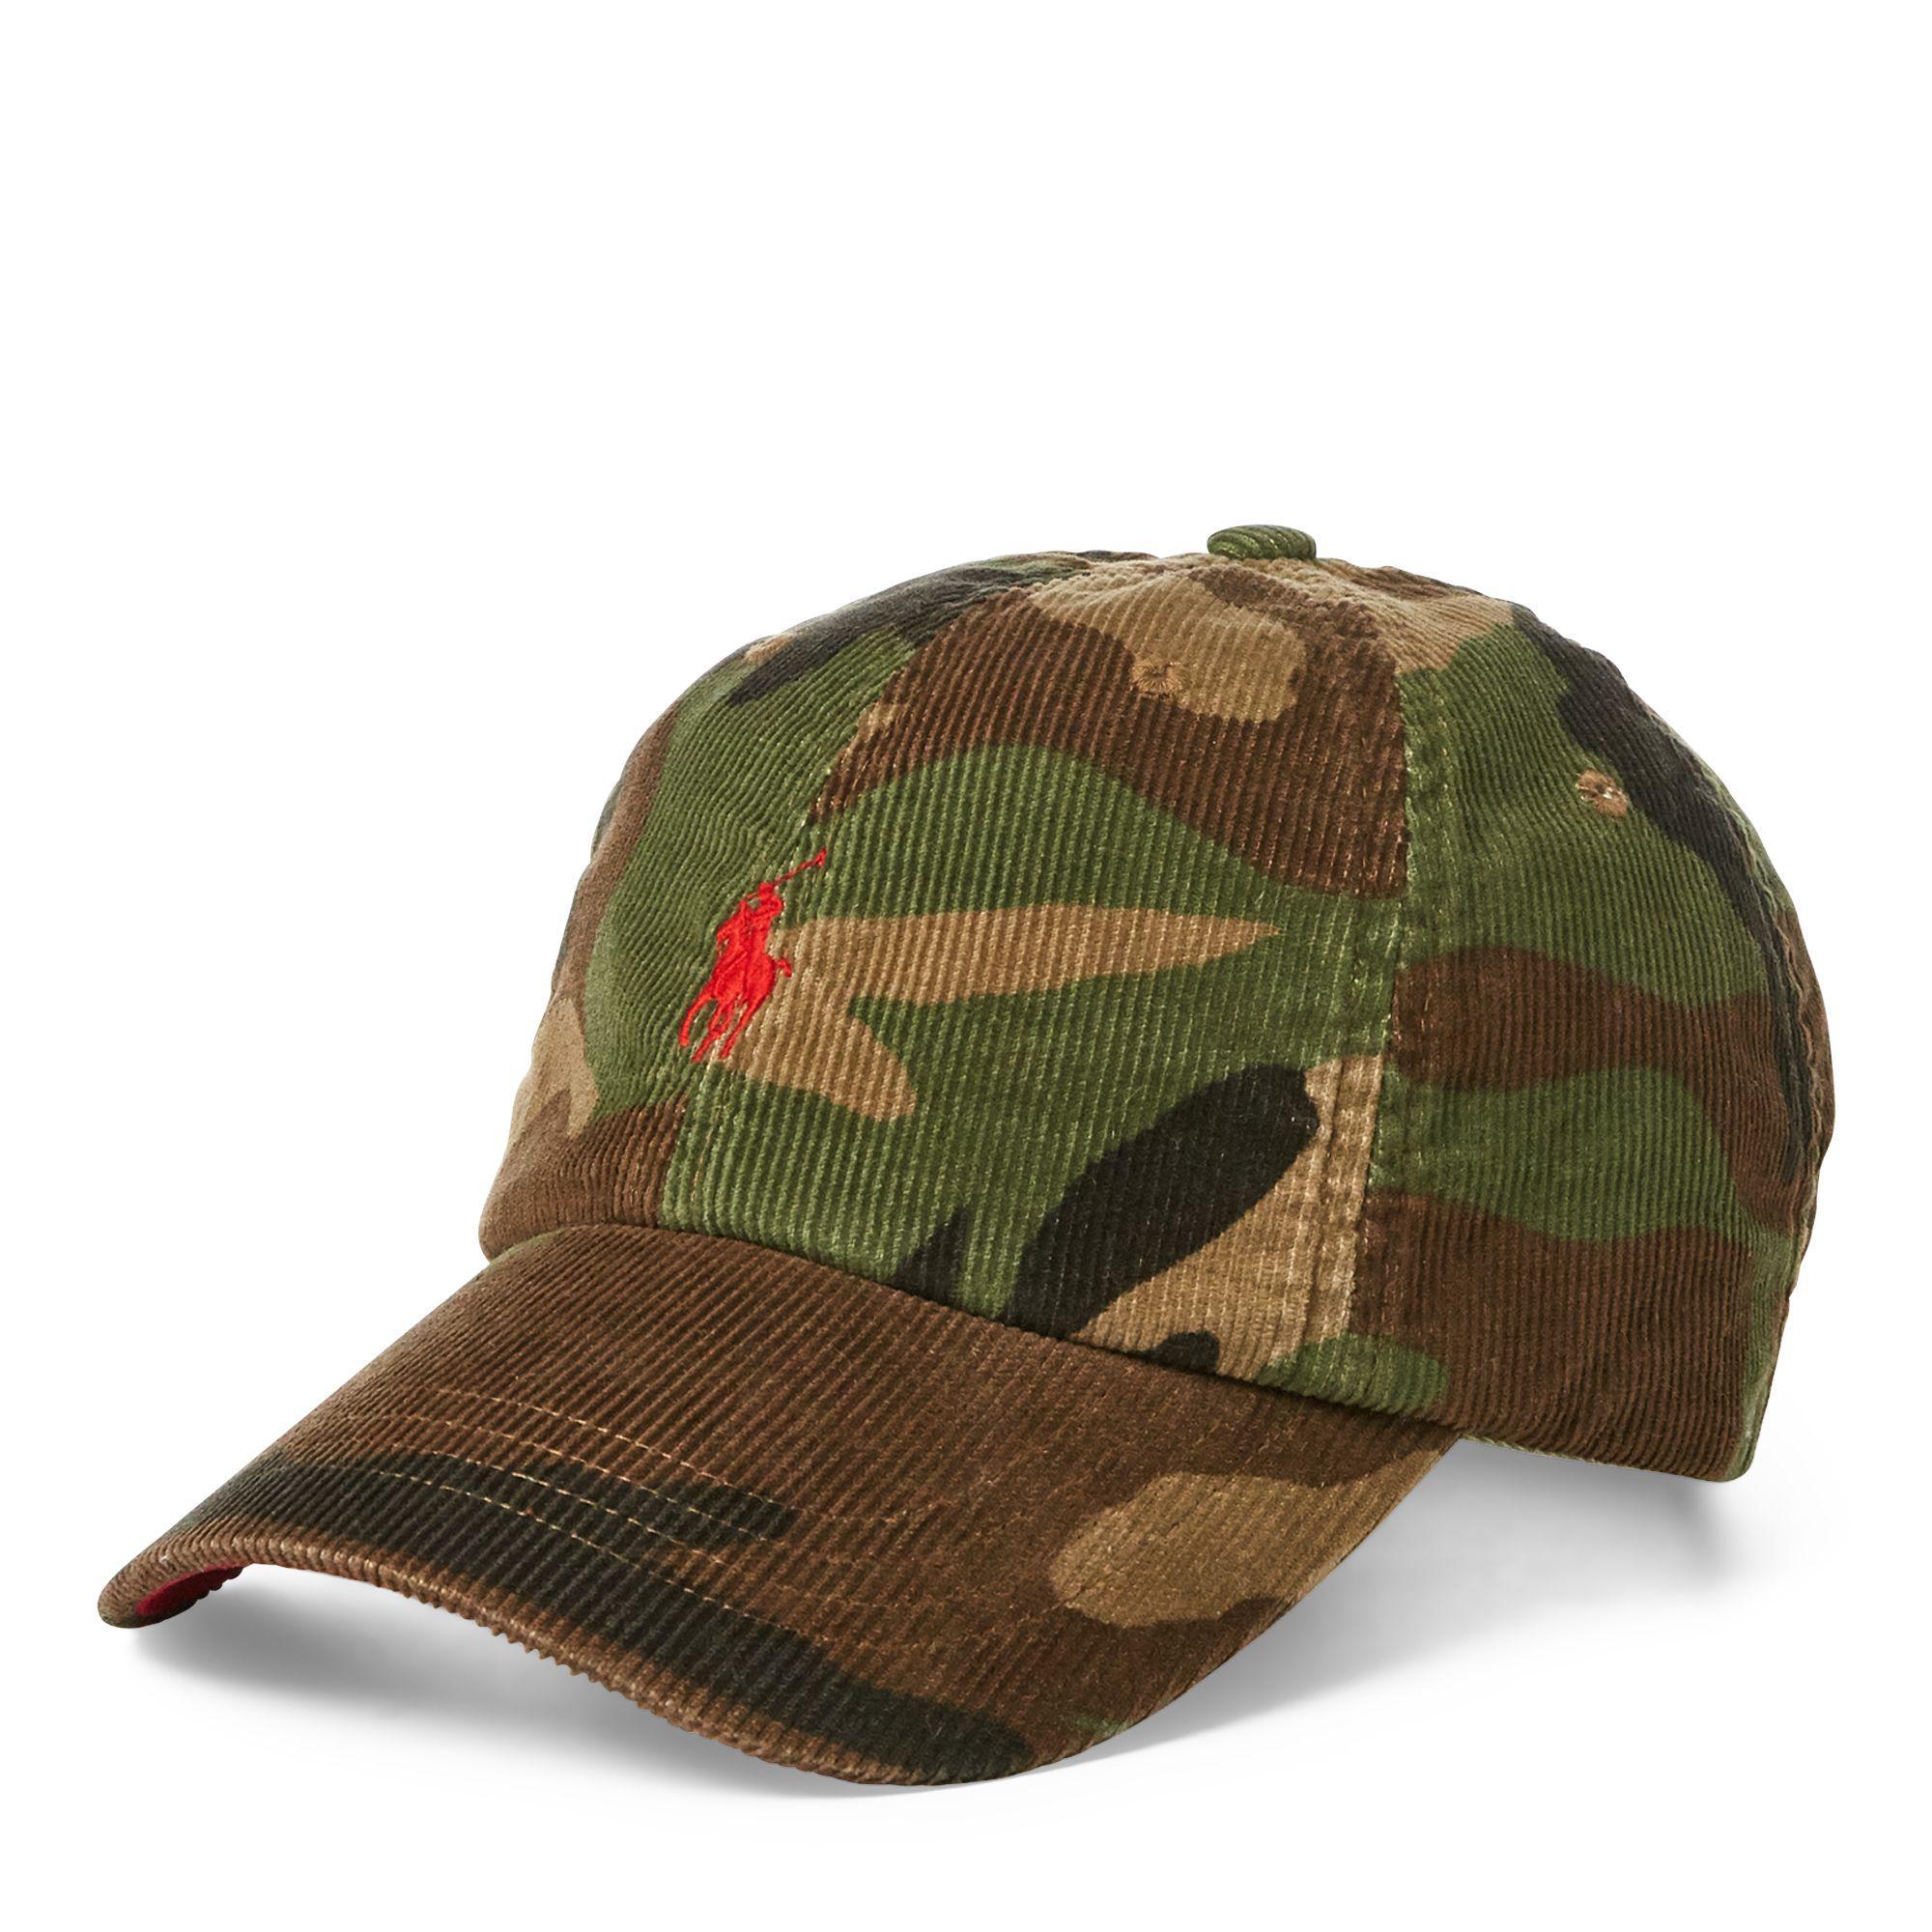 8aa82279dede01 Polo Ralph Lauren Camo Corduroy Baseball Cap in Green for Men - Lyst